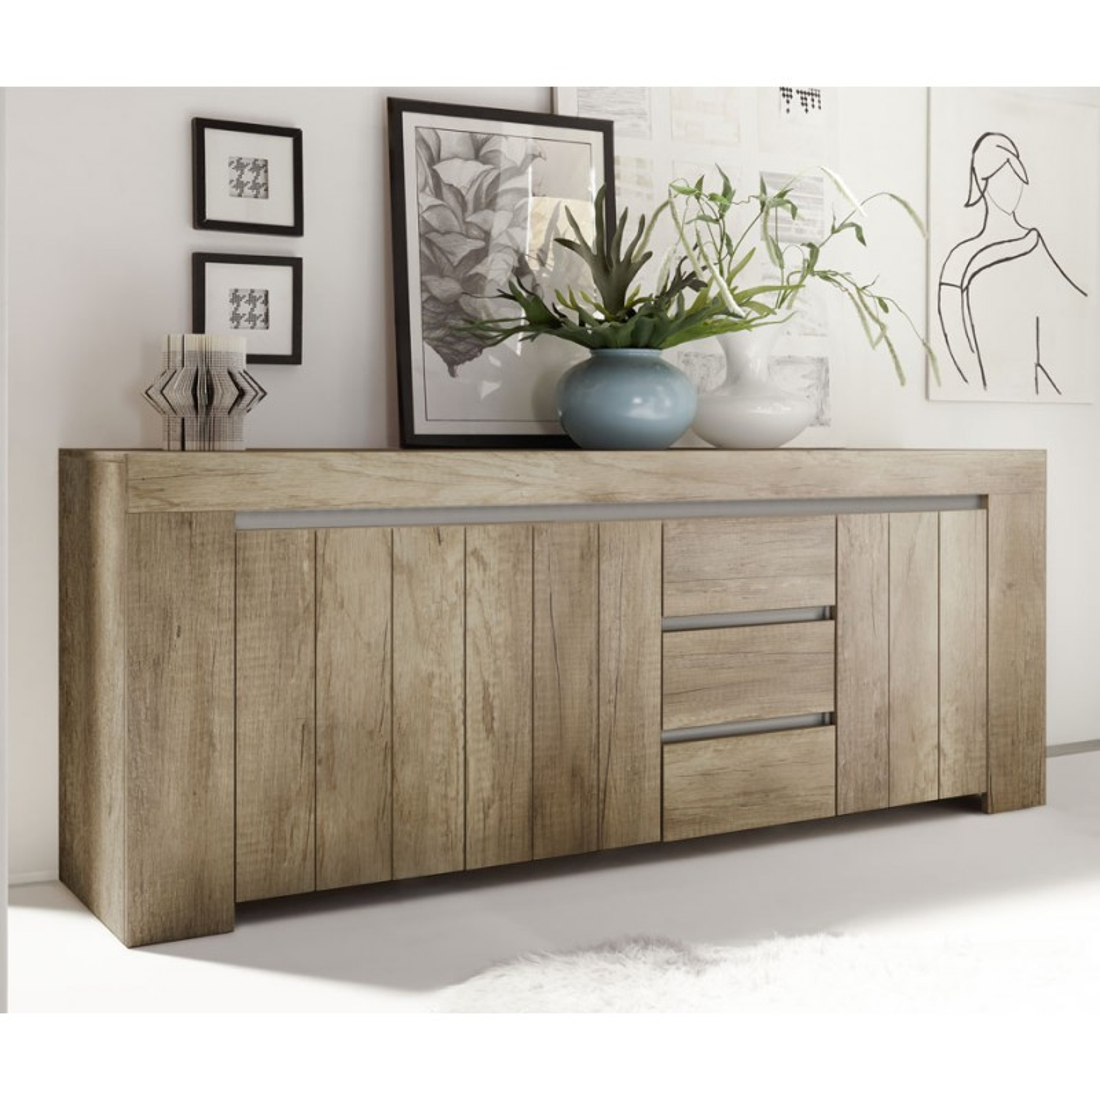 buffet ch ne moyen 3 portes 3 tiroirs almati univers salle manger. Black Bedroom Furniture Sets. Home Design Ideas